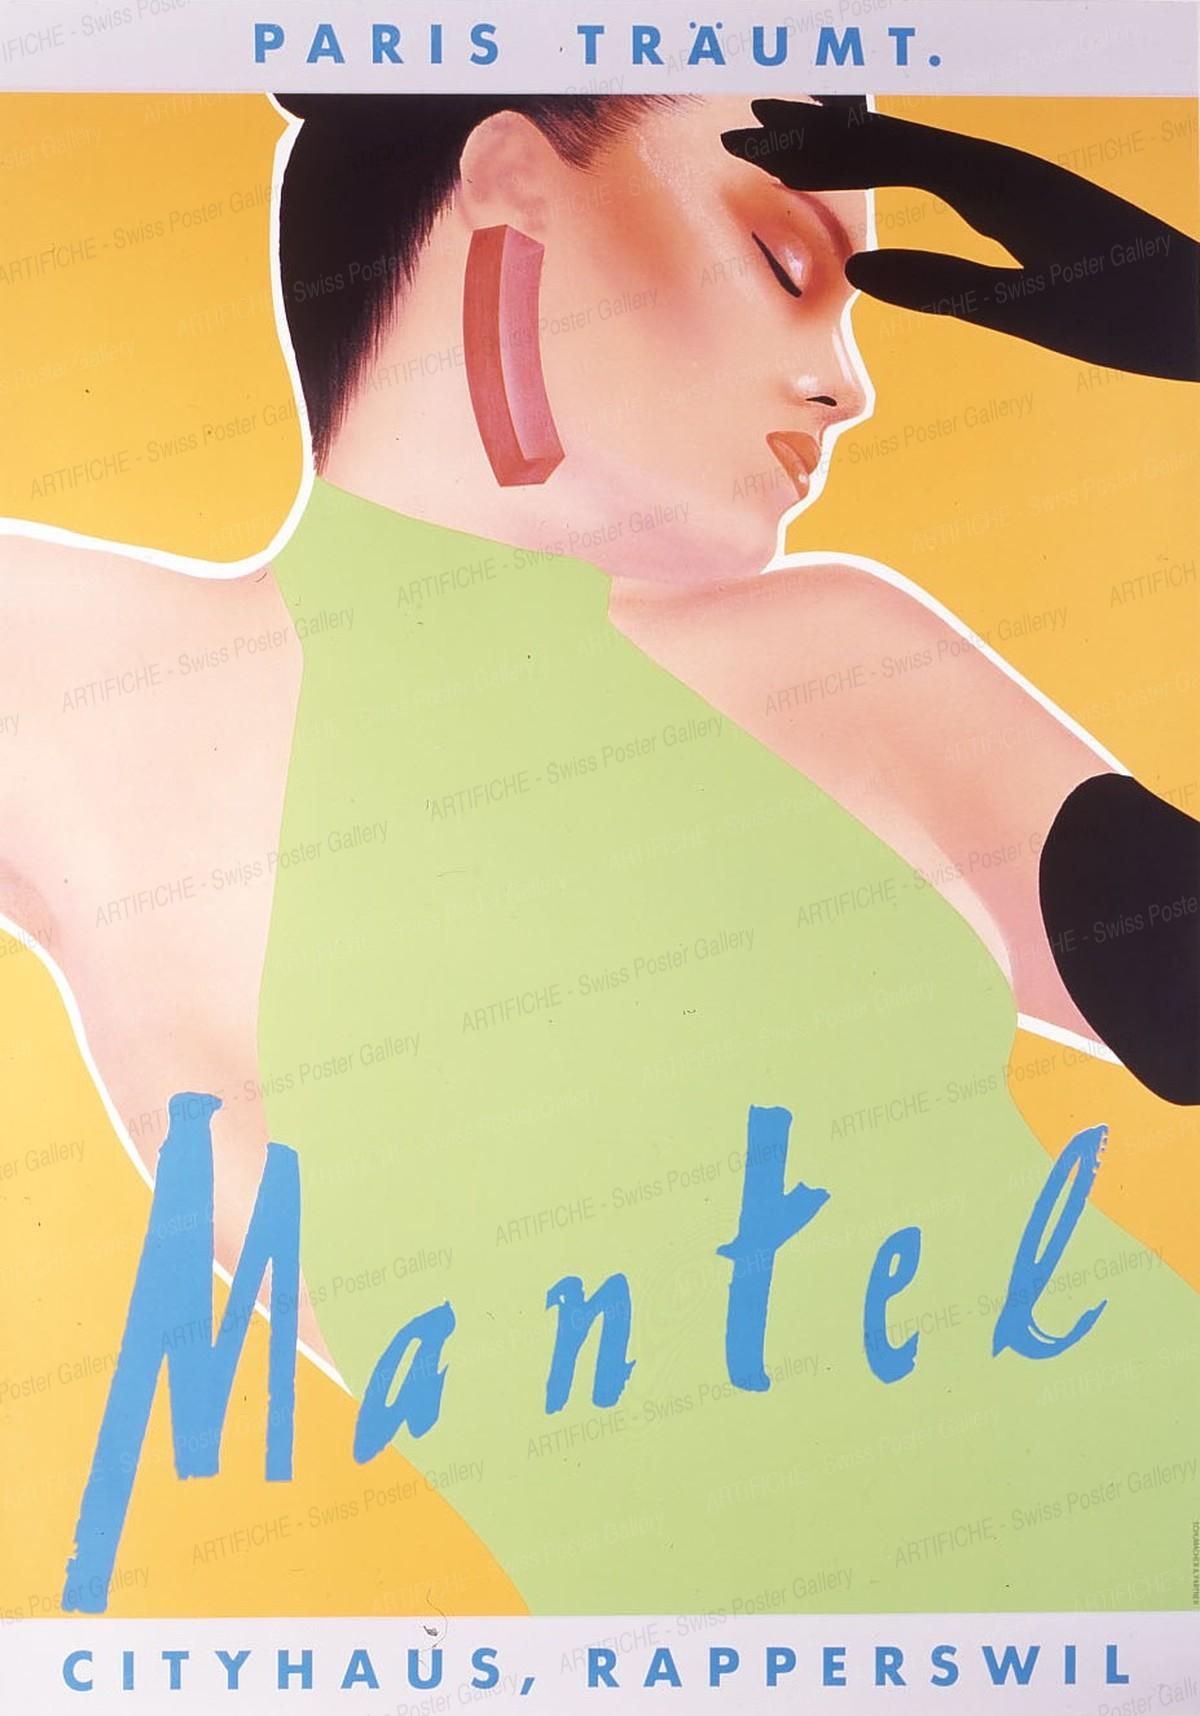 Cityhaus Mantel Fashion Store – Paris is dreaming., Rémy Fabrikant